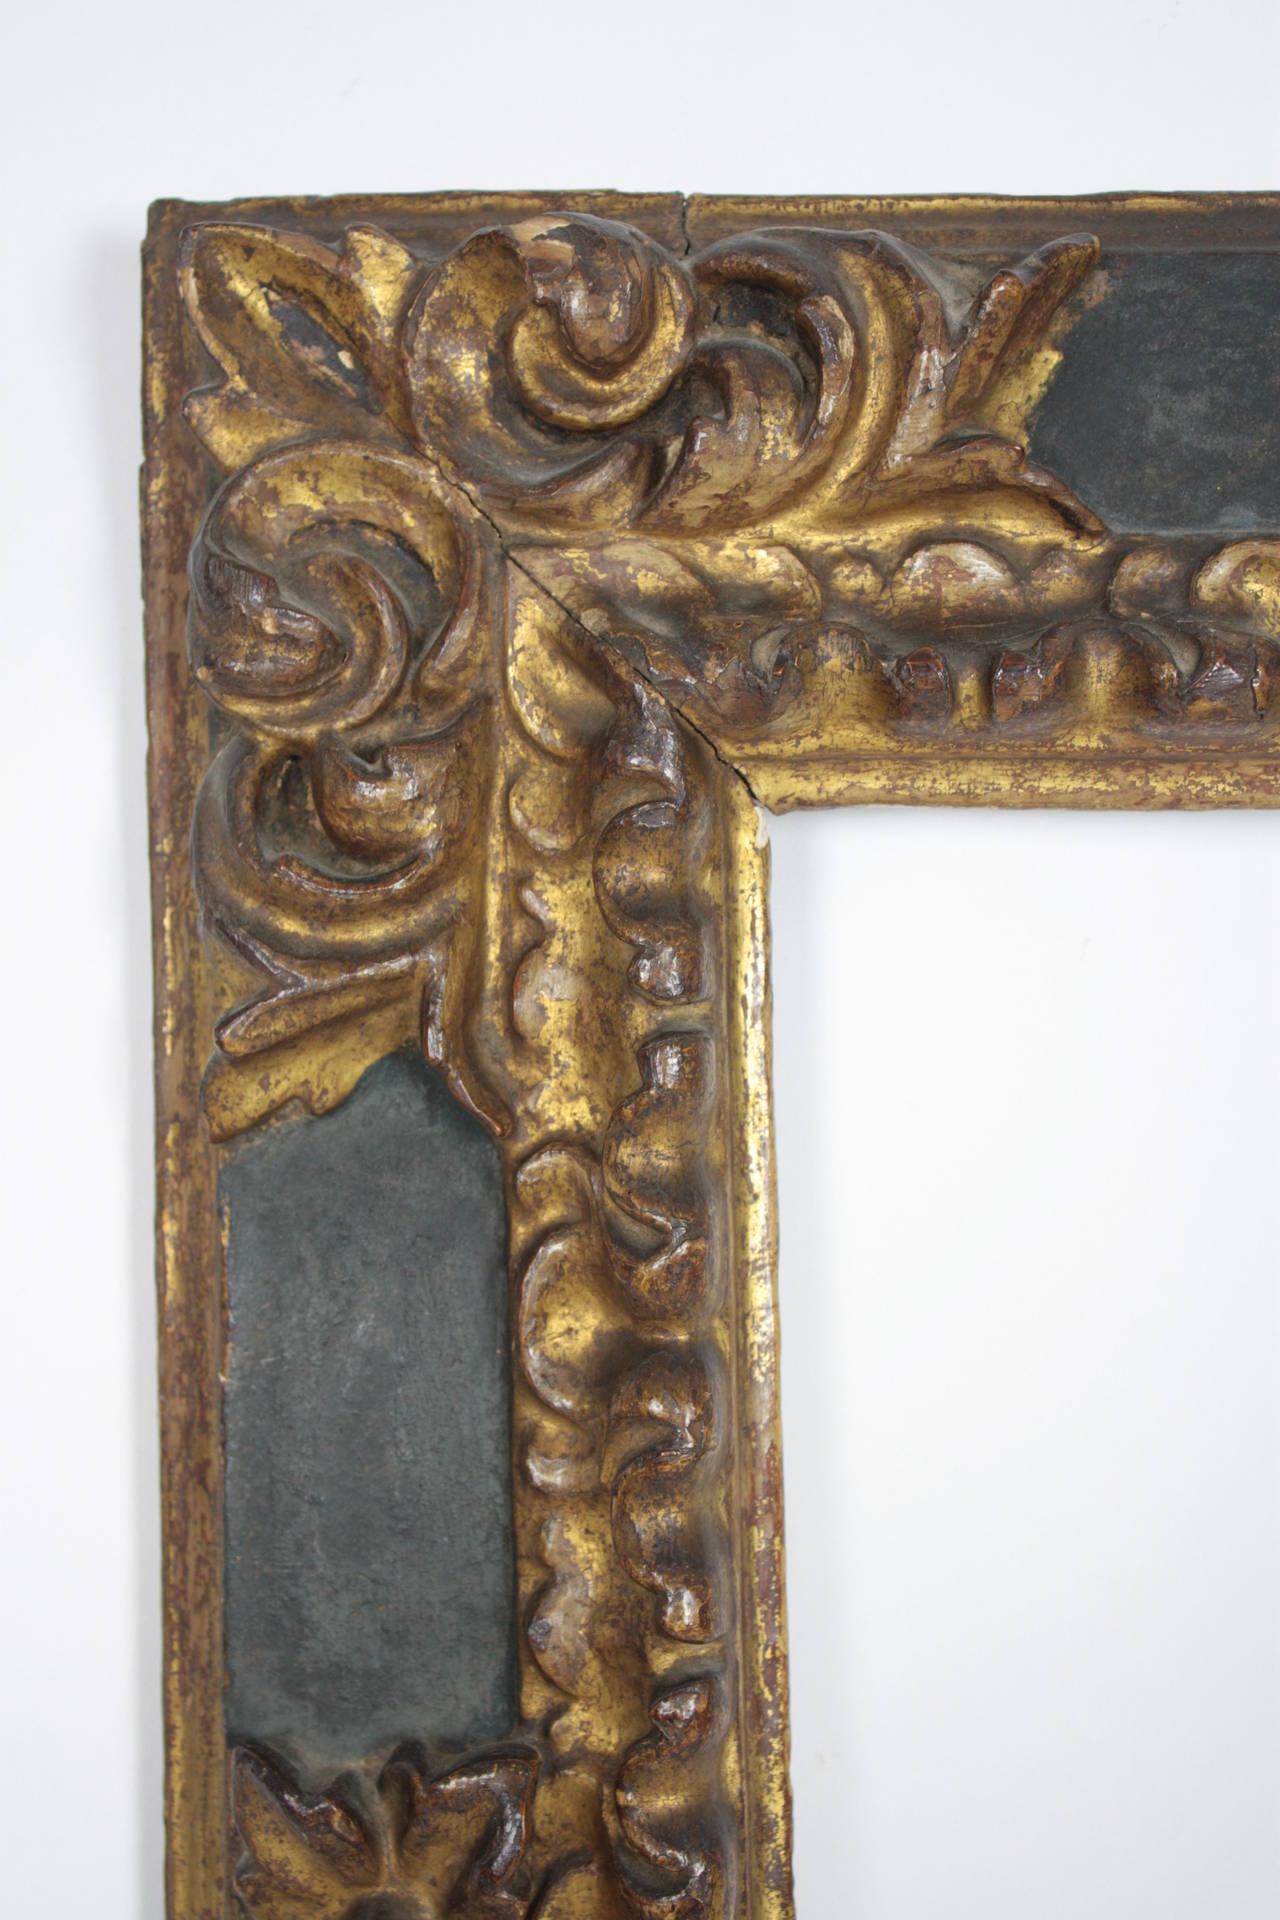 17th Century Spanish Baroque Polychromed Carved Wood Gold Leaf Frame For Sale 3